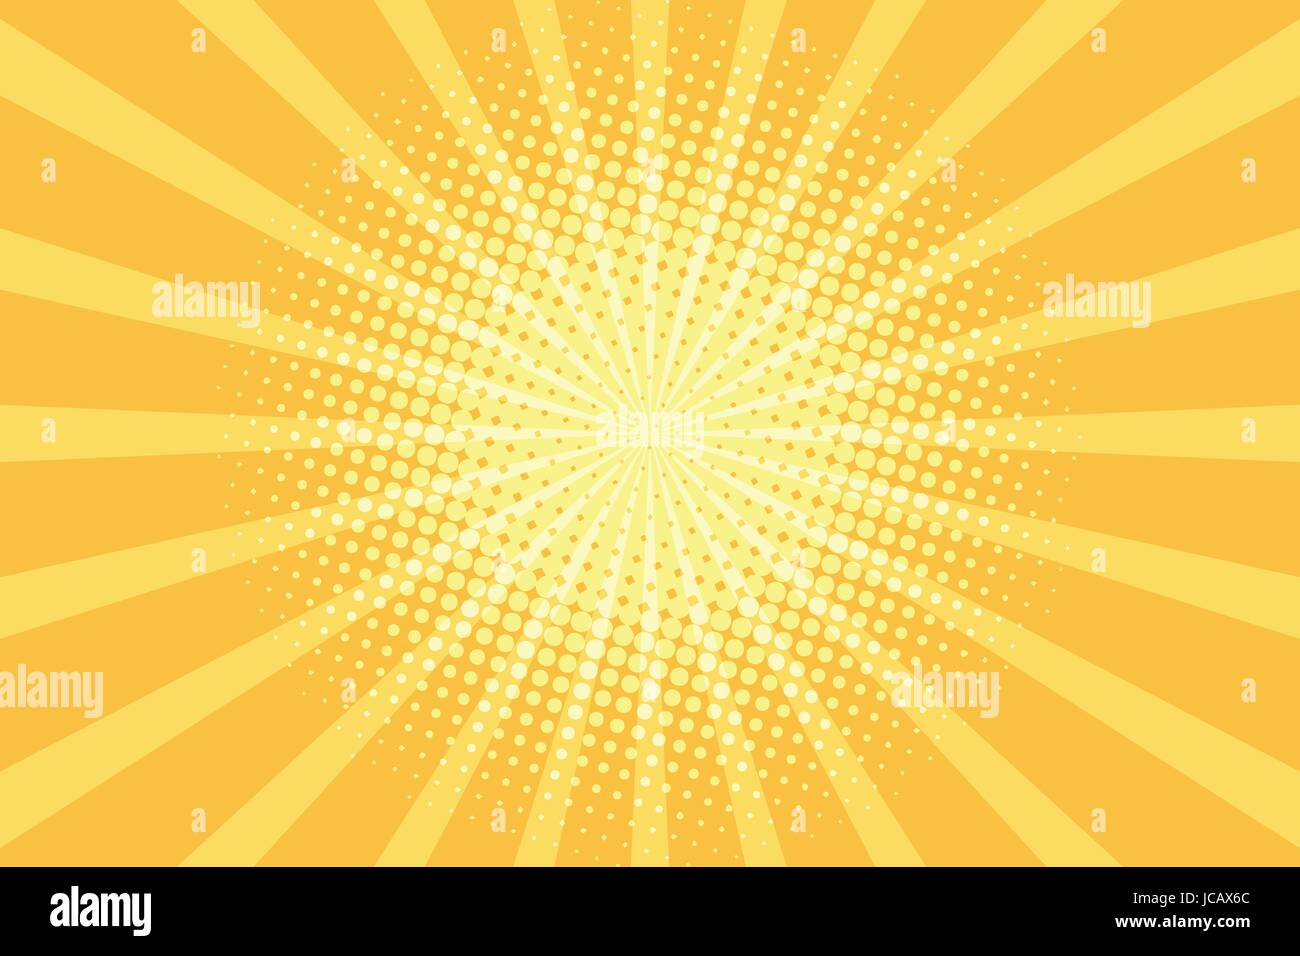 yellow rays pop art background. retro vector illustration - Stock Image